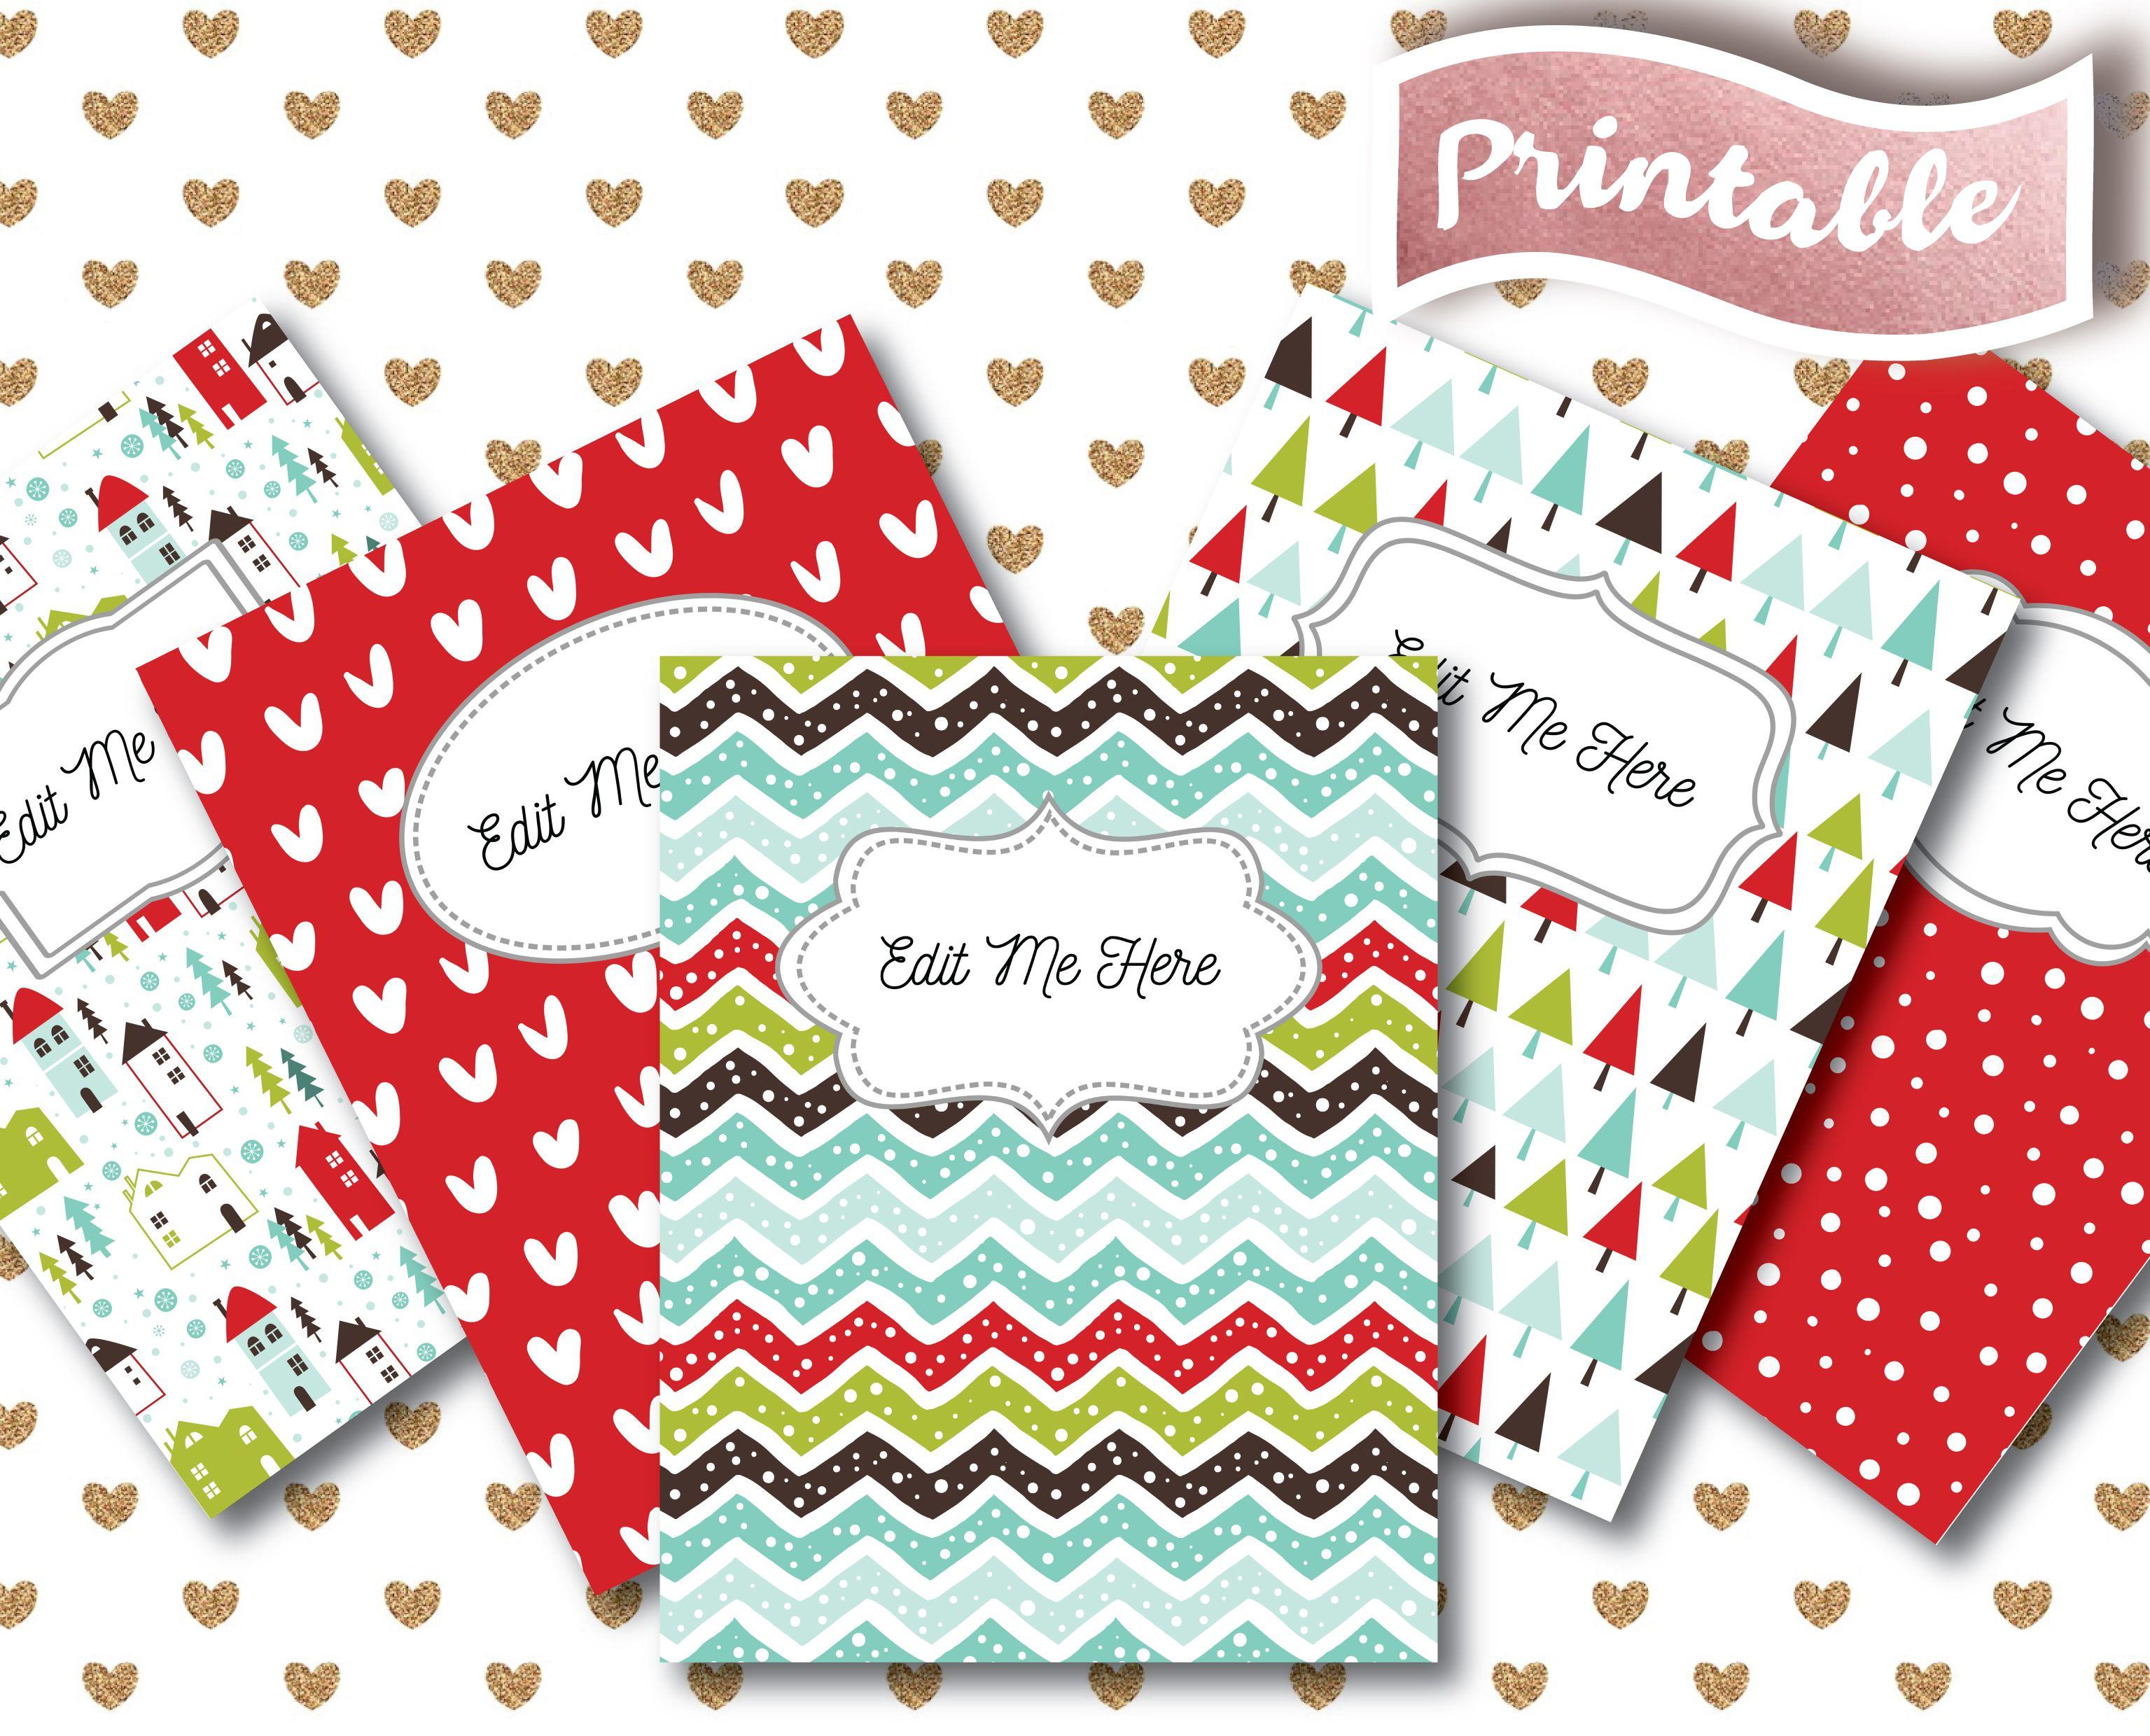 teacher binder cover page spines custom editable binder summer college student plan organizer a4 school inserts pdf sale discount